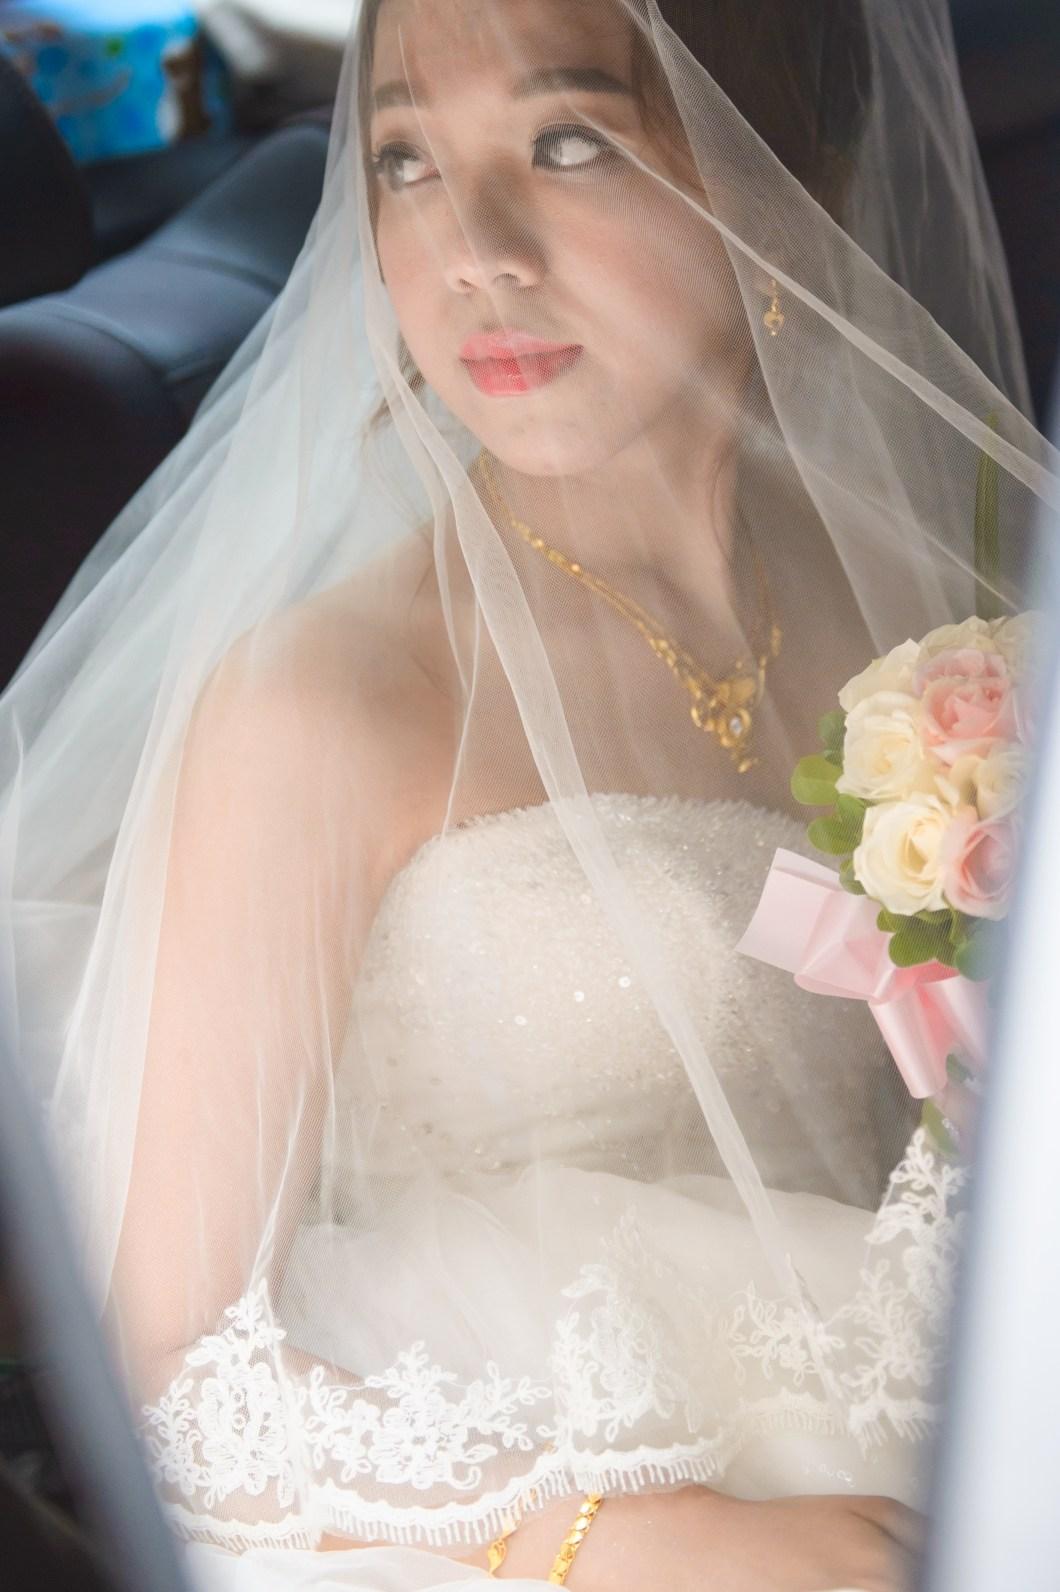 CHERI法式手工婚紗,林葳,婚攝優哥,華漾美麗華,Palais de Chine Hotel Taipei,婚攝推薦,新竹婚攝